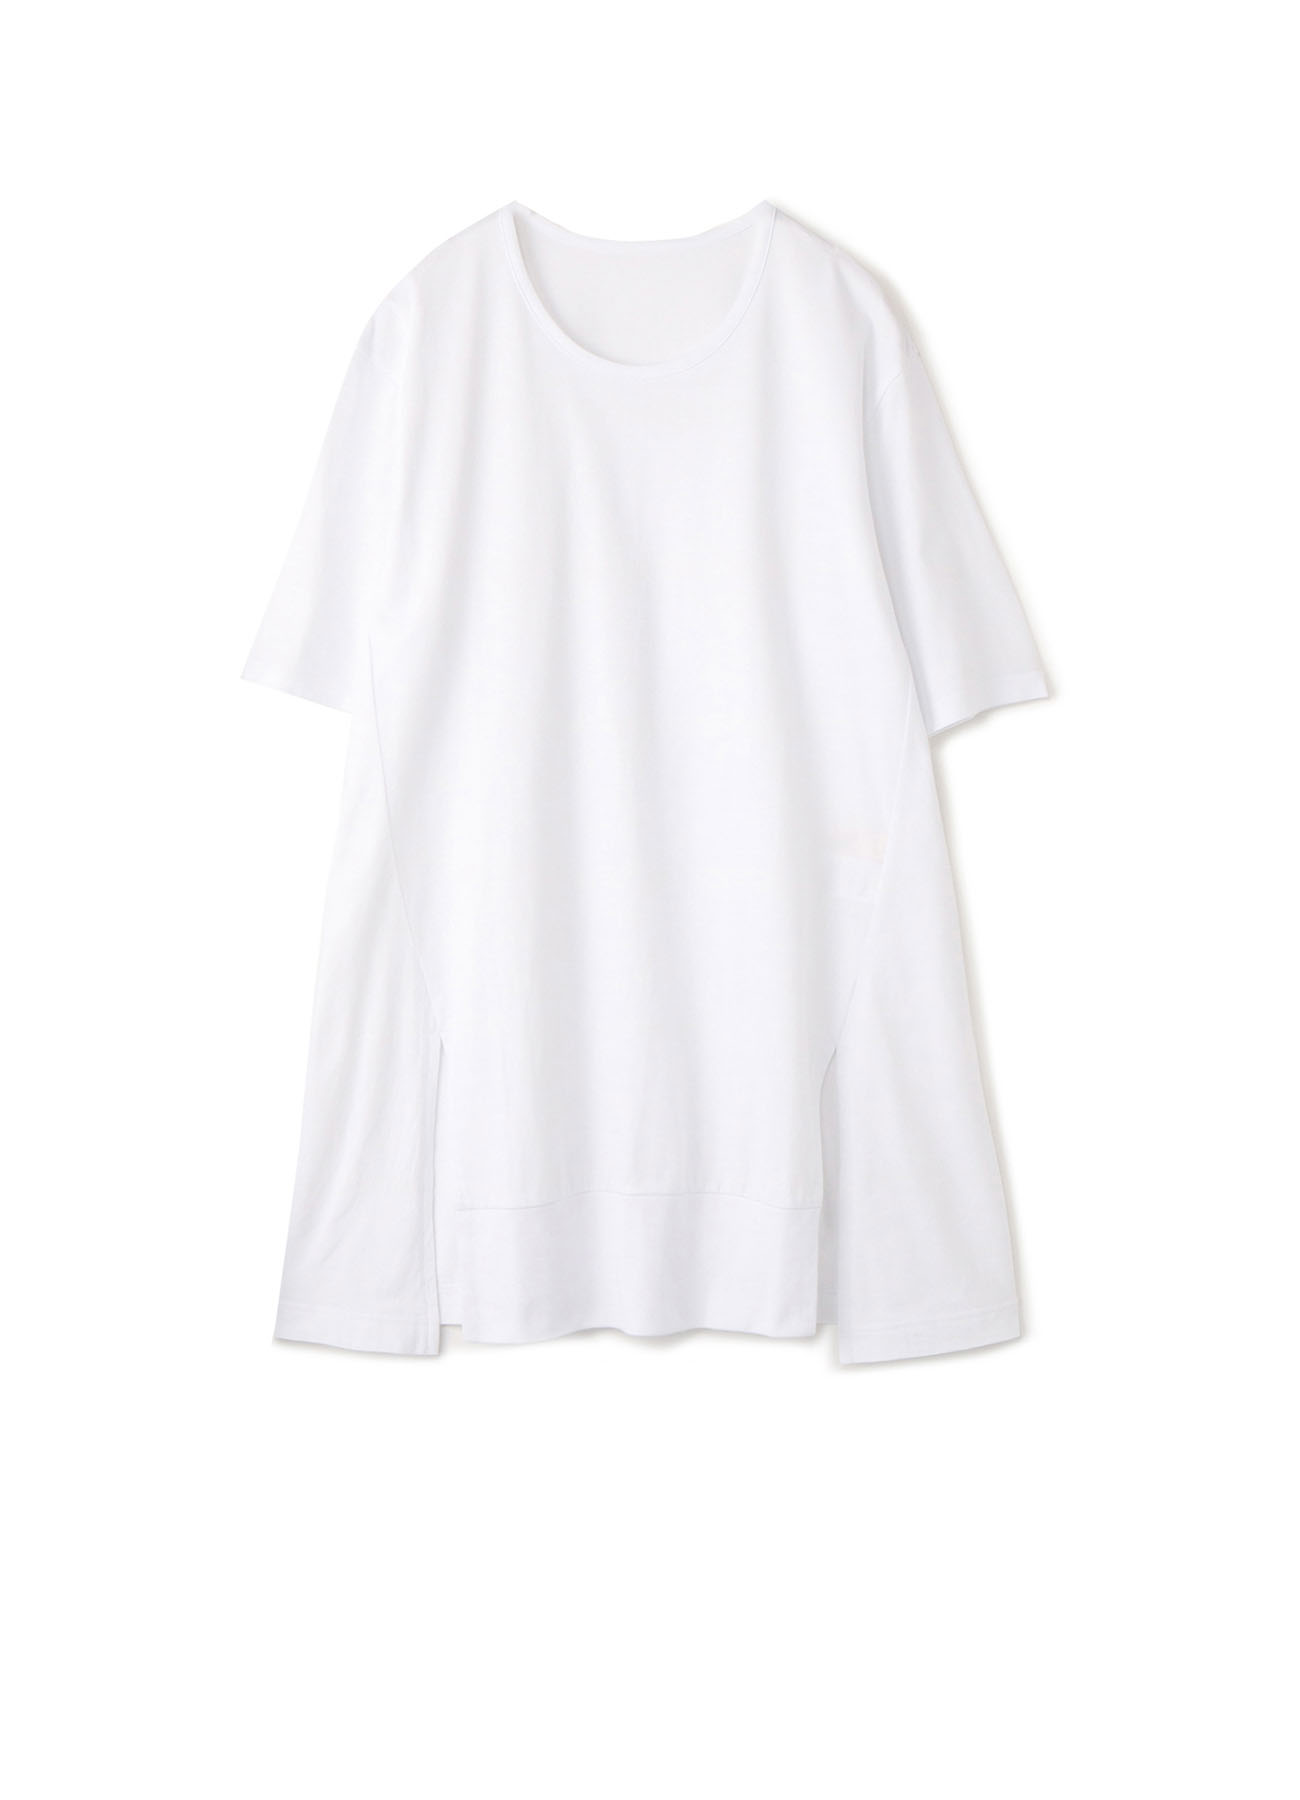 30/Cotton Jersey Hem Cutting Cut Sew